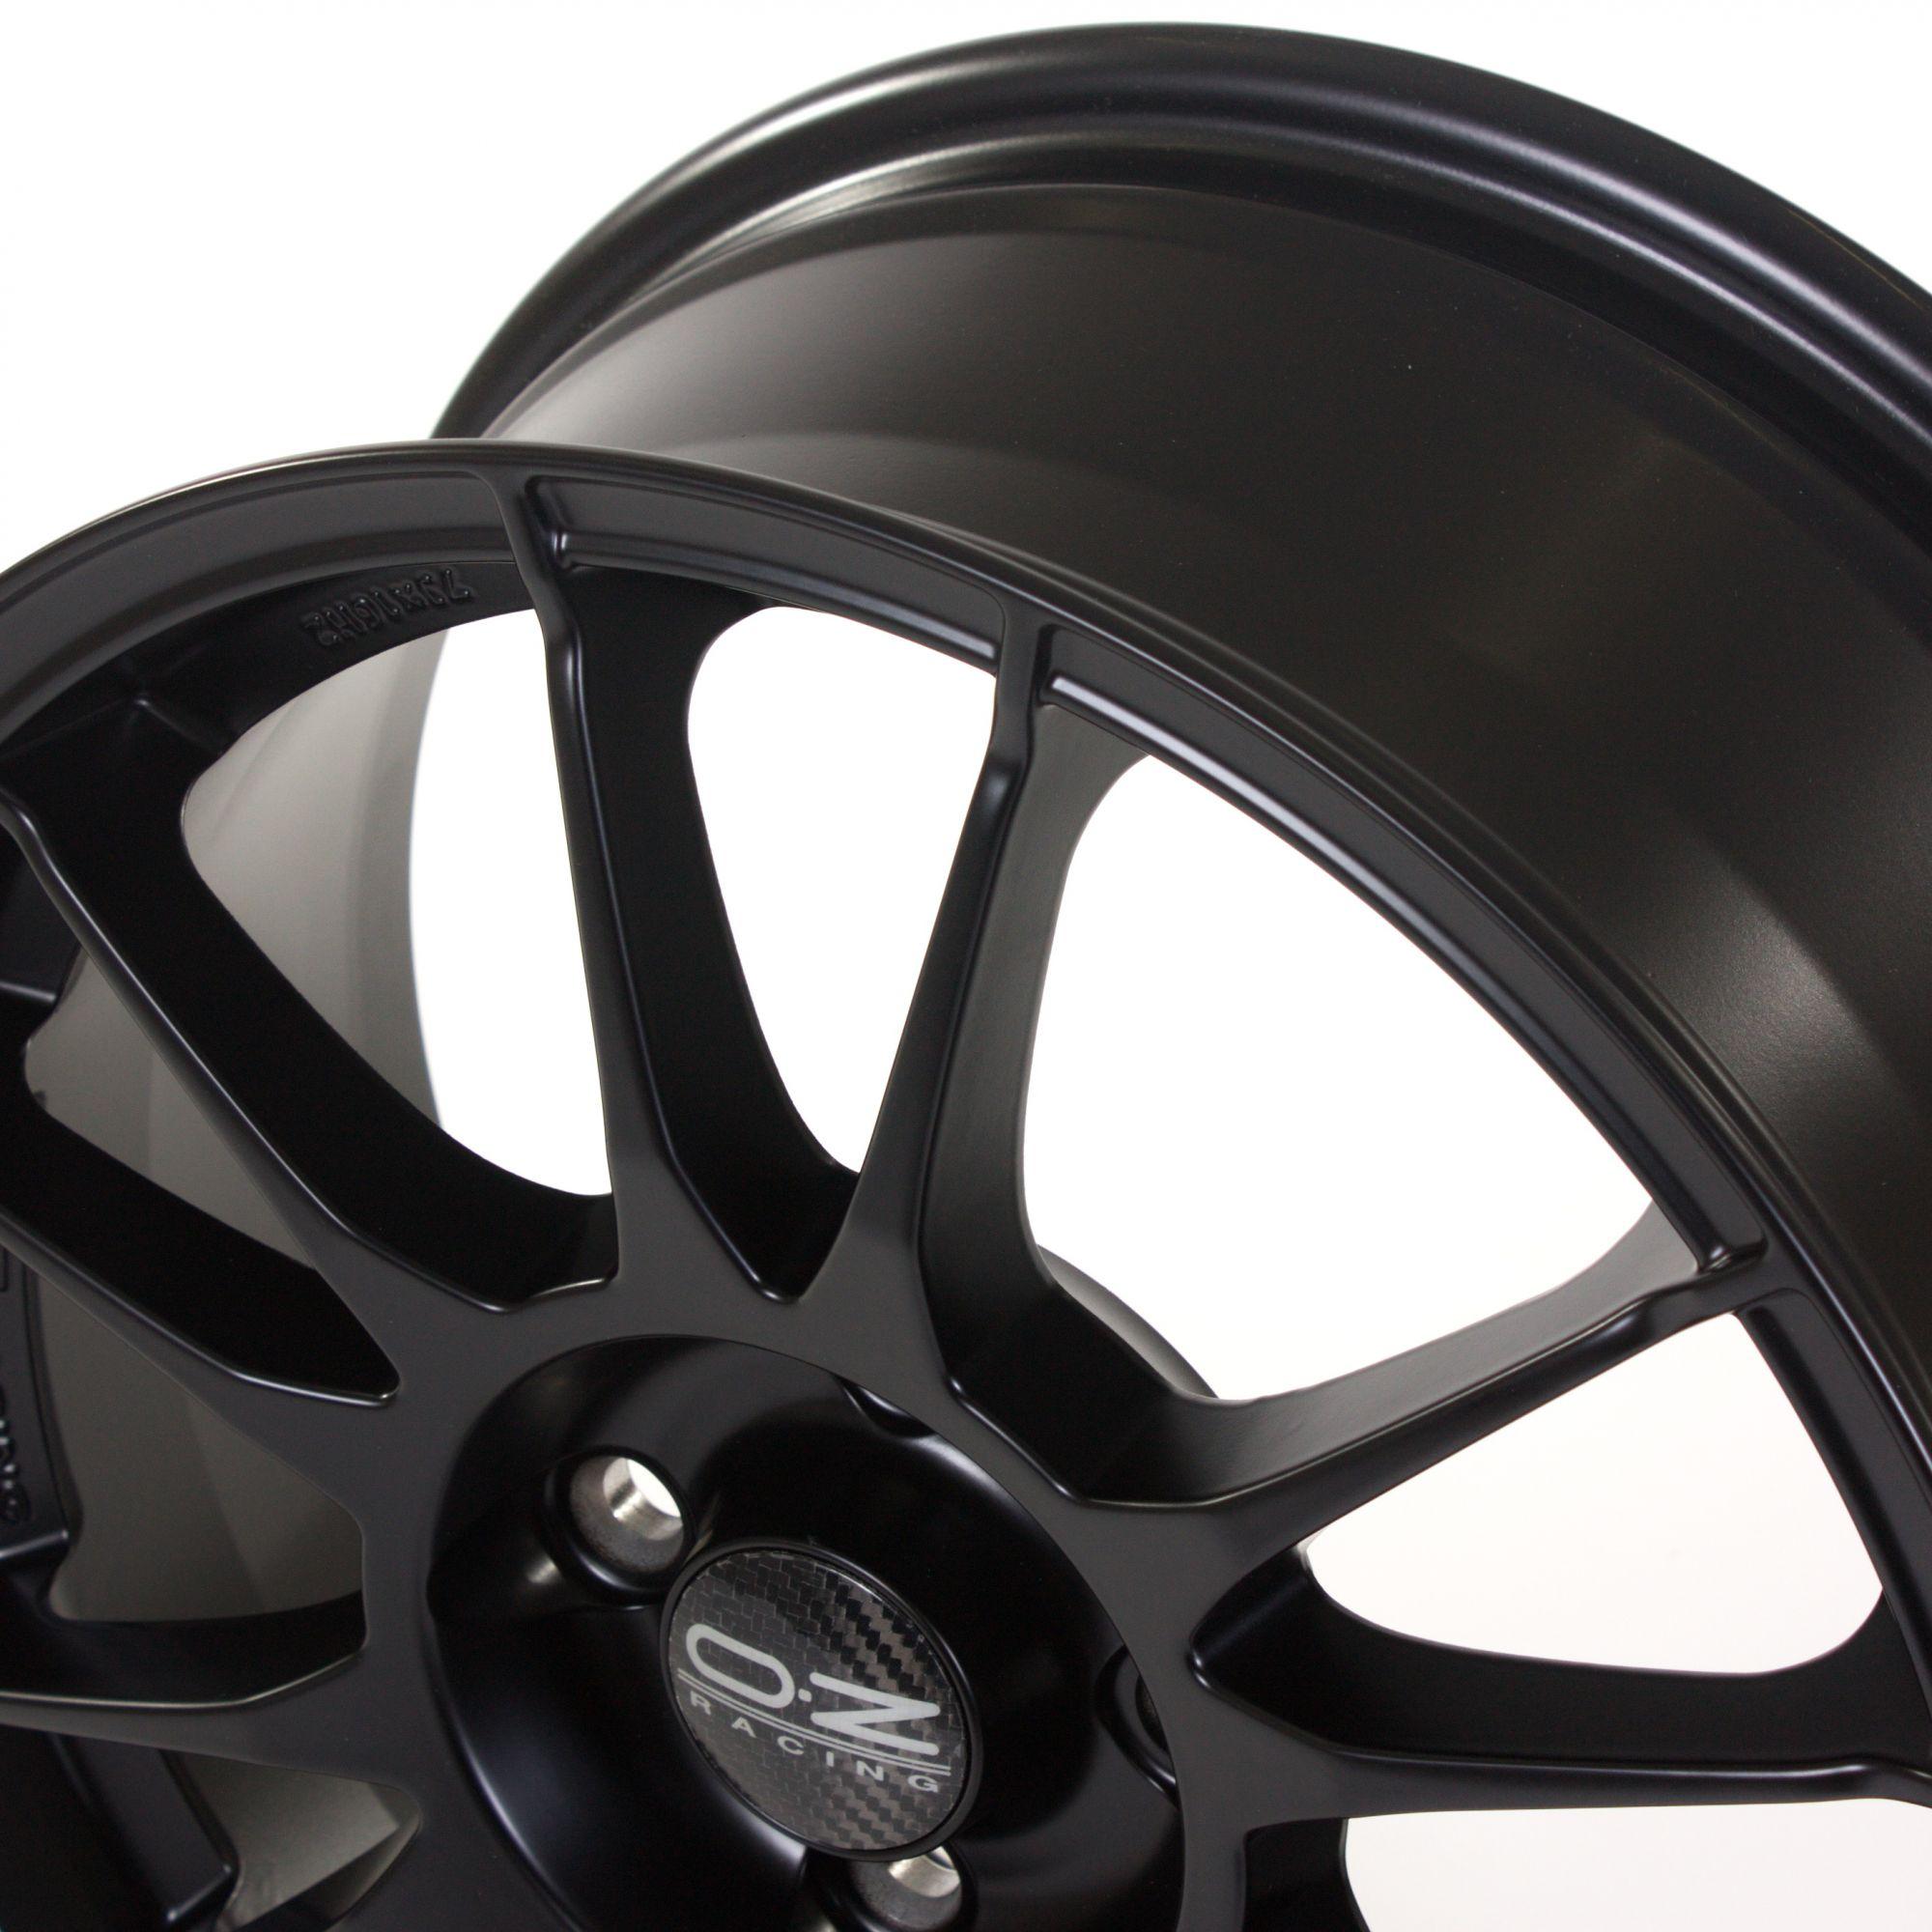 oz racing ultraleggera felgen matt black schwarz in 16 zoll. Black Bedroom Furniture Sets. Home Design Ideas